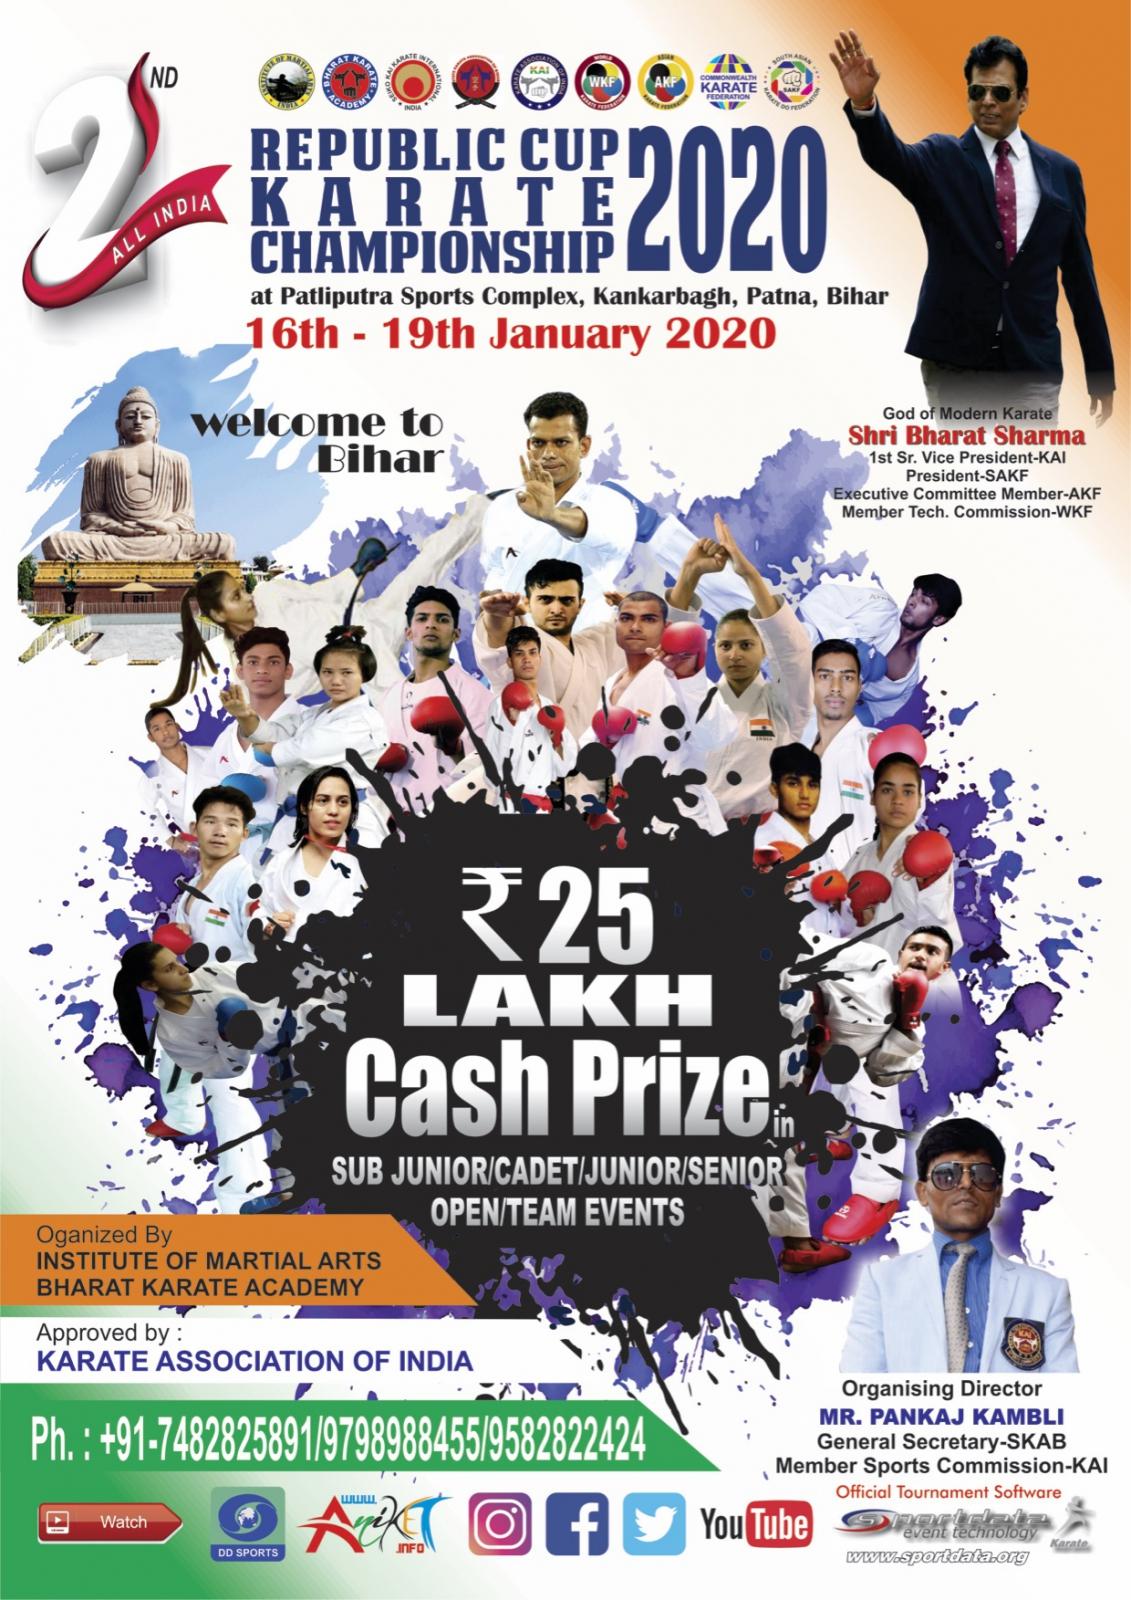 Set Online Karate: Republic Cup Karate Championship 2020 intended for Bihar Govt Official Calendar 2020